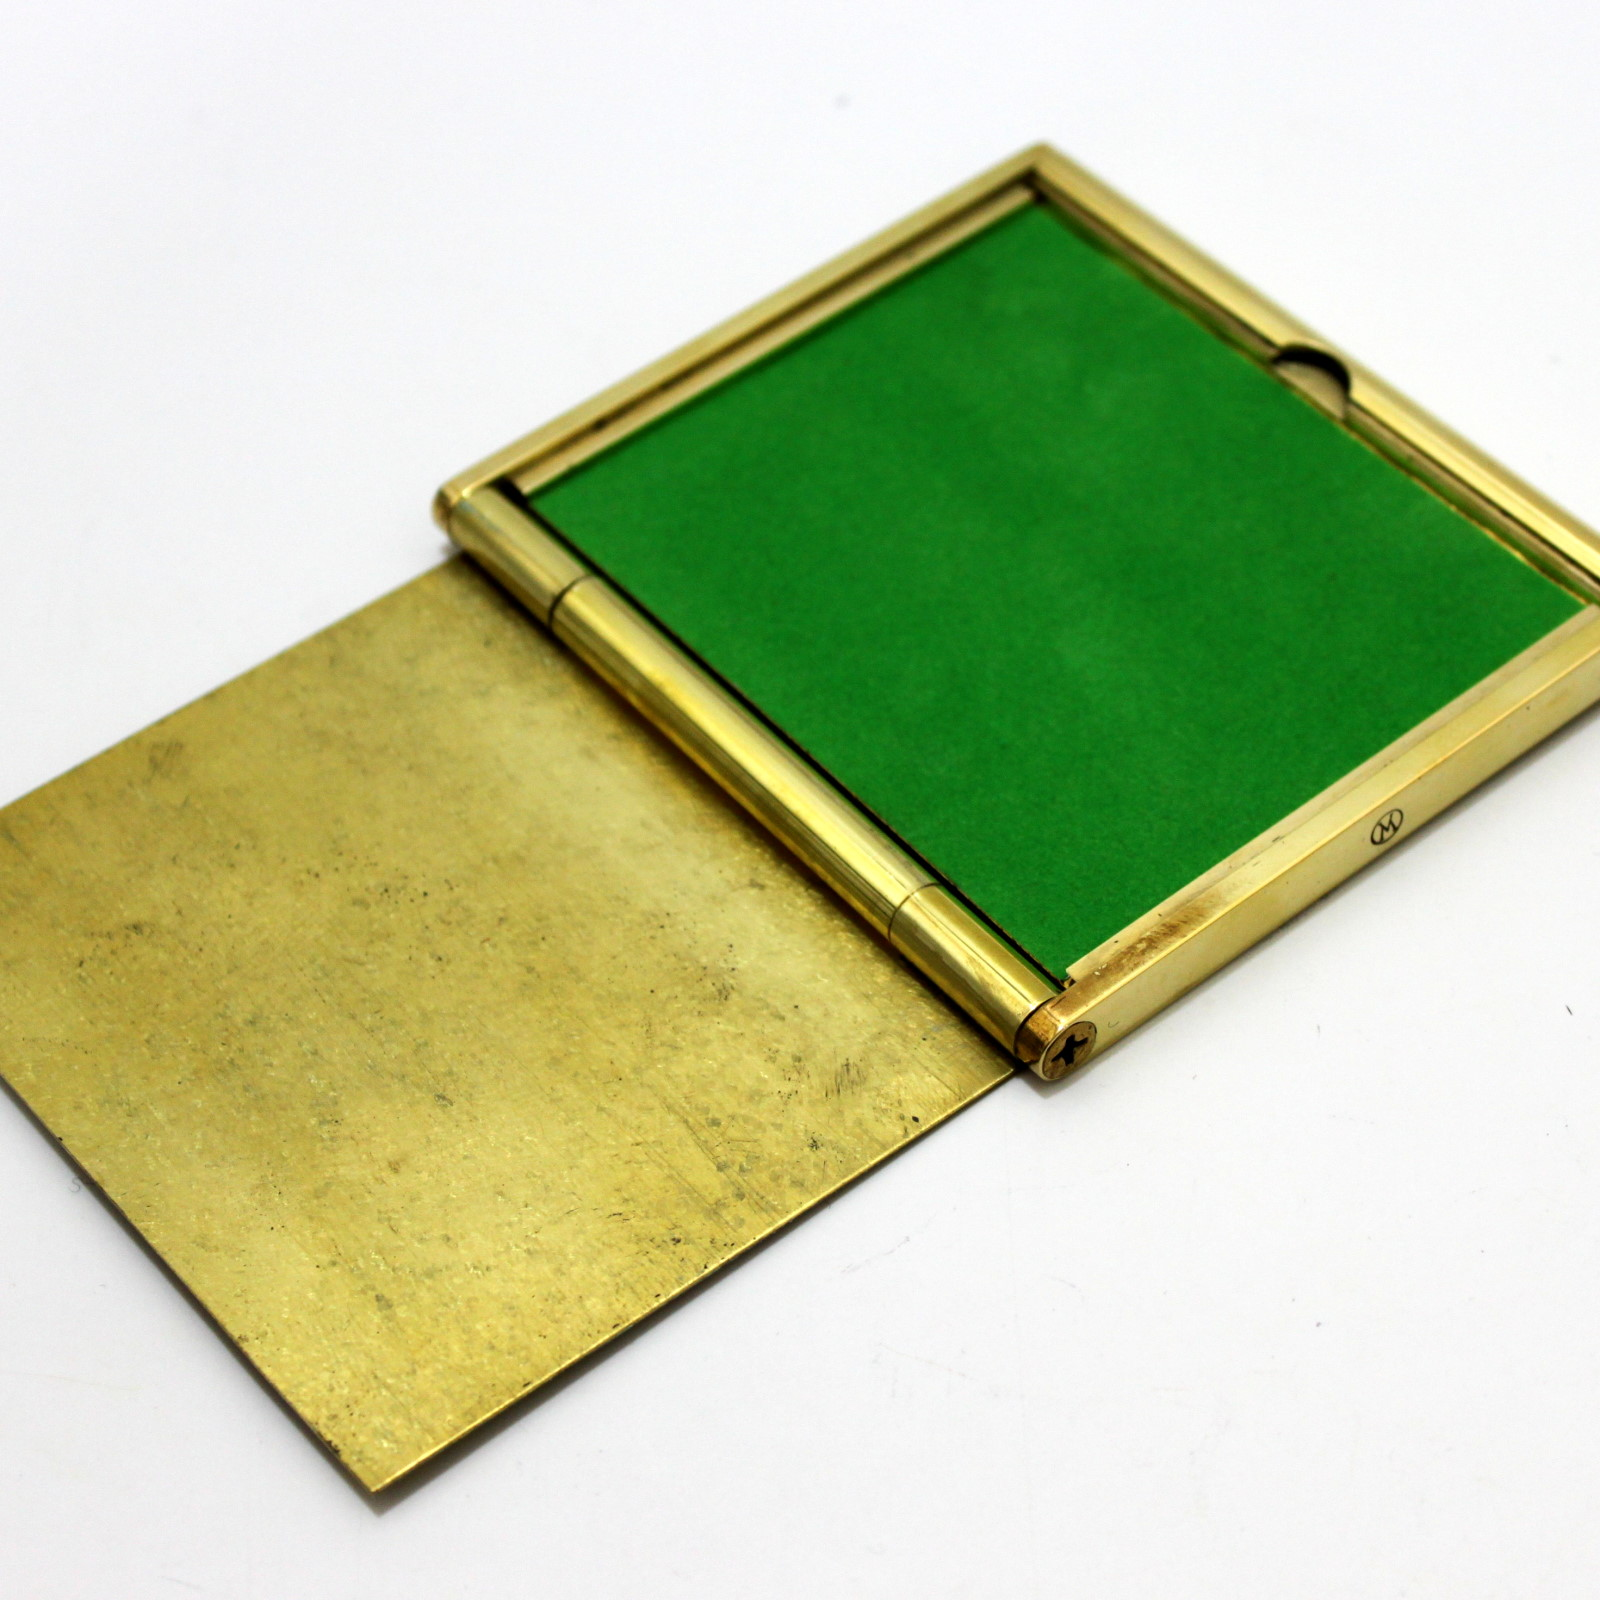 Brema Brass Thin Model Card Box (Version 3) by Viking Mfg.